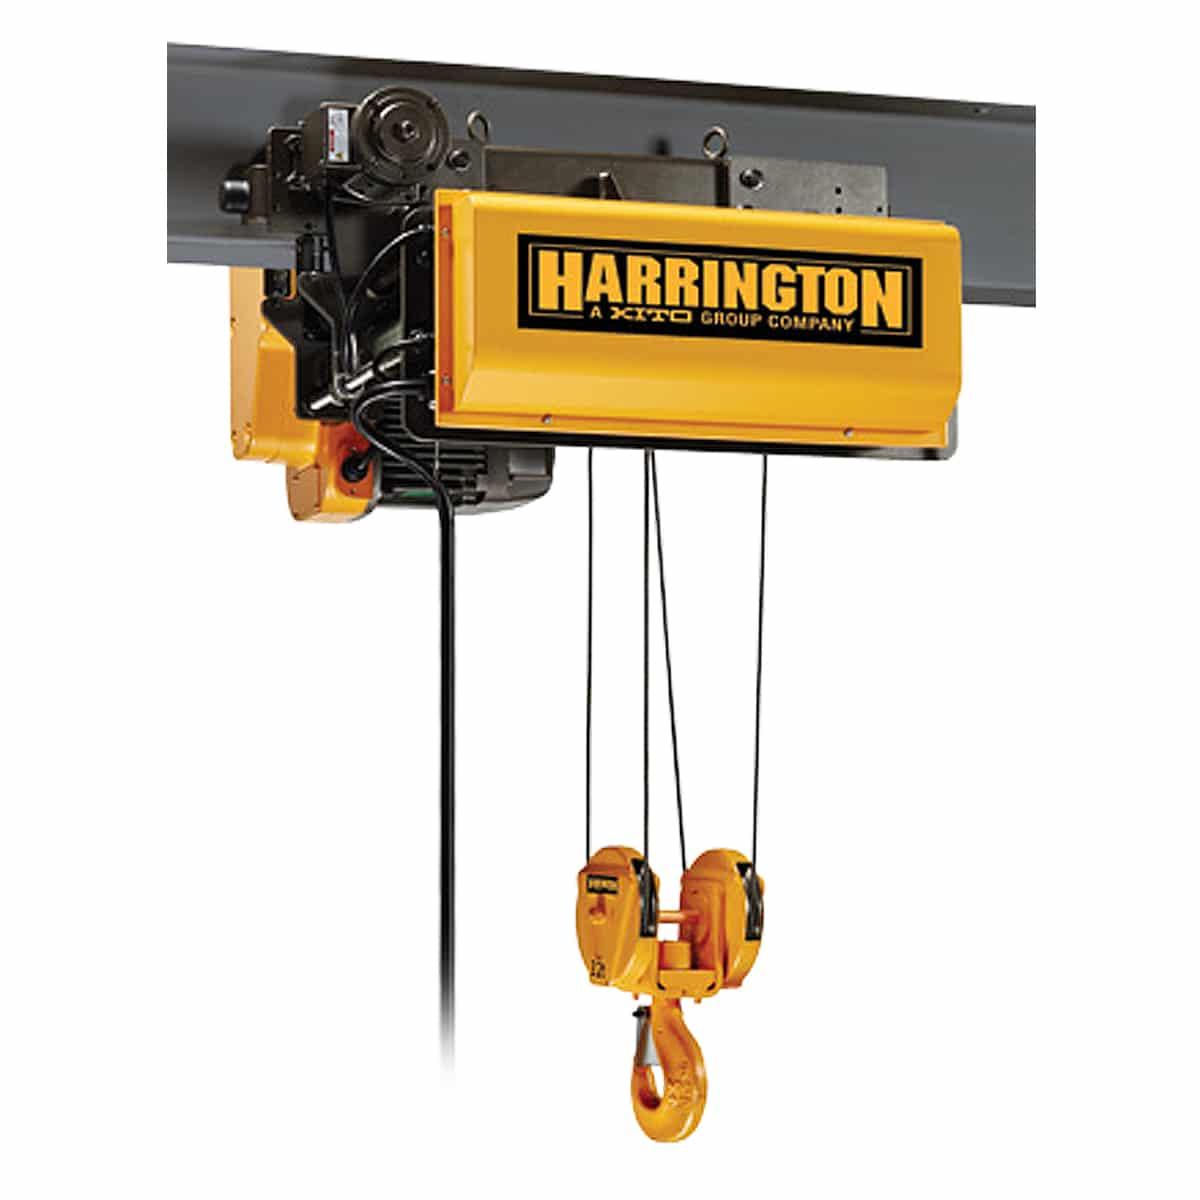 Harrington RY Series Wire Rope Hoist